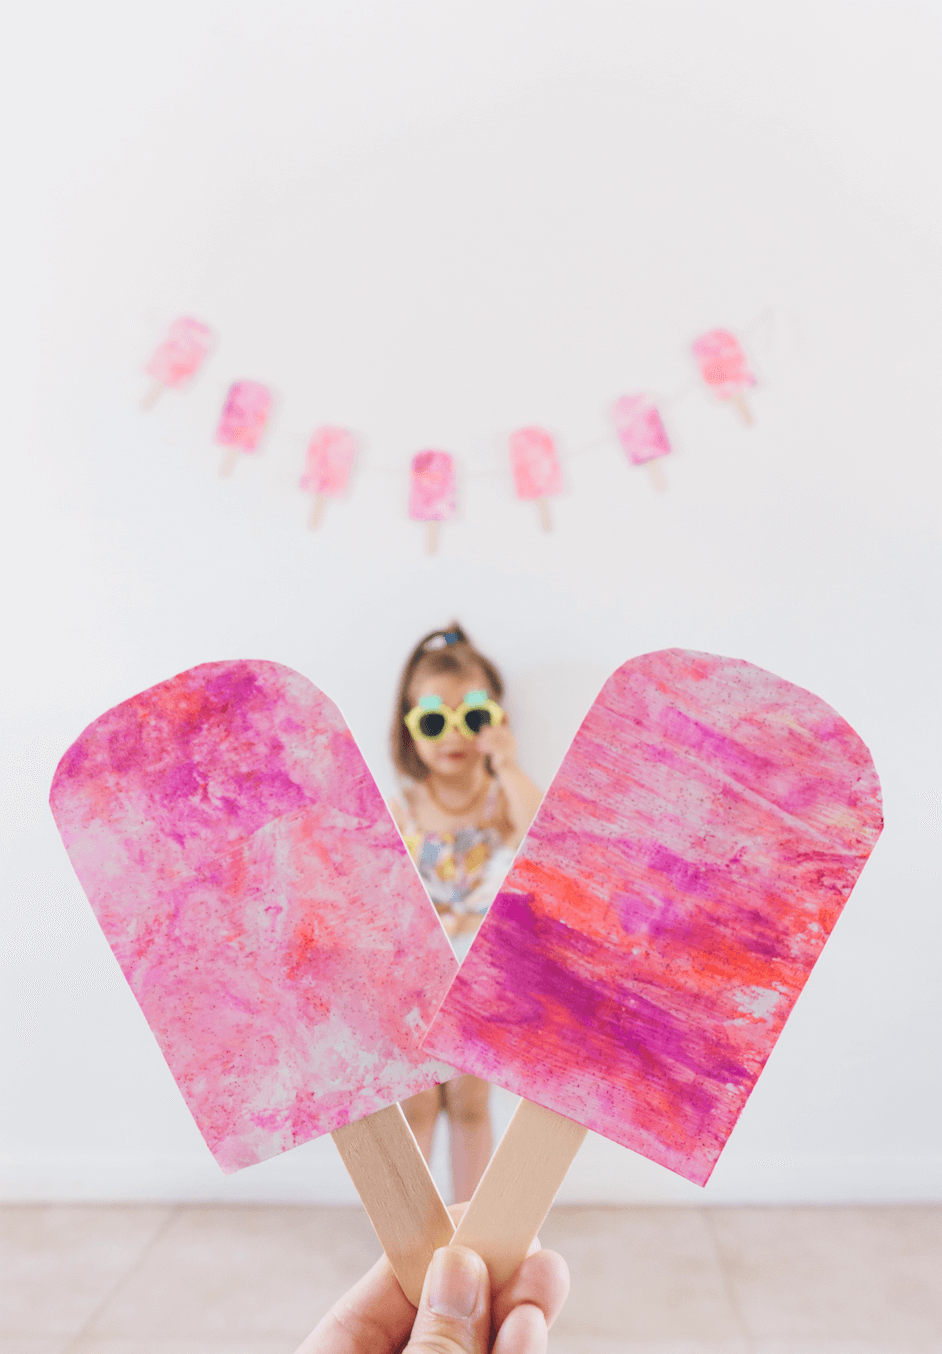 Popsicle | Marble Shaving Cream Paint Art | Toddler DIY | tiffanieanne.com